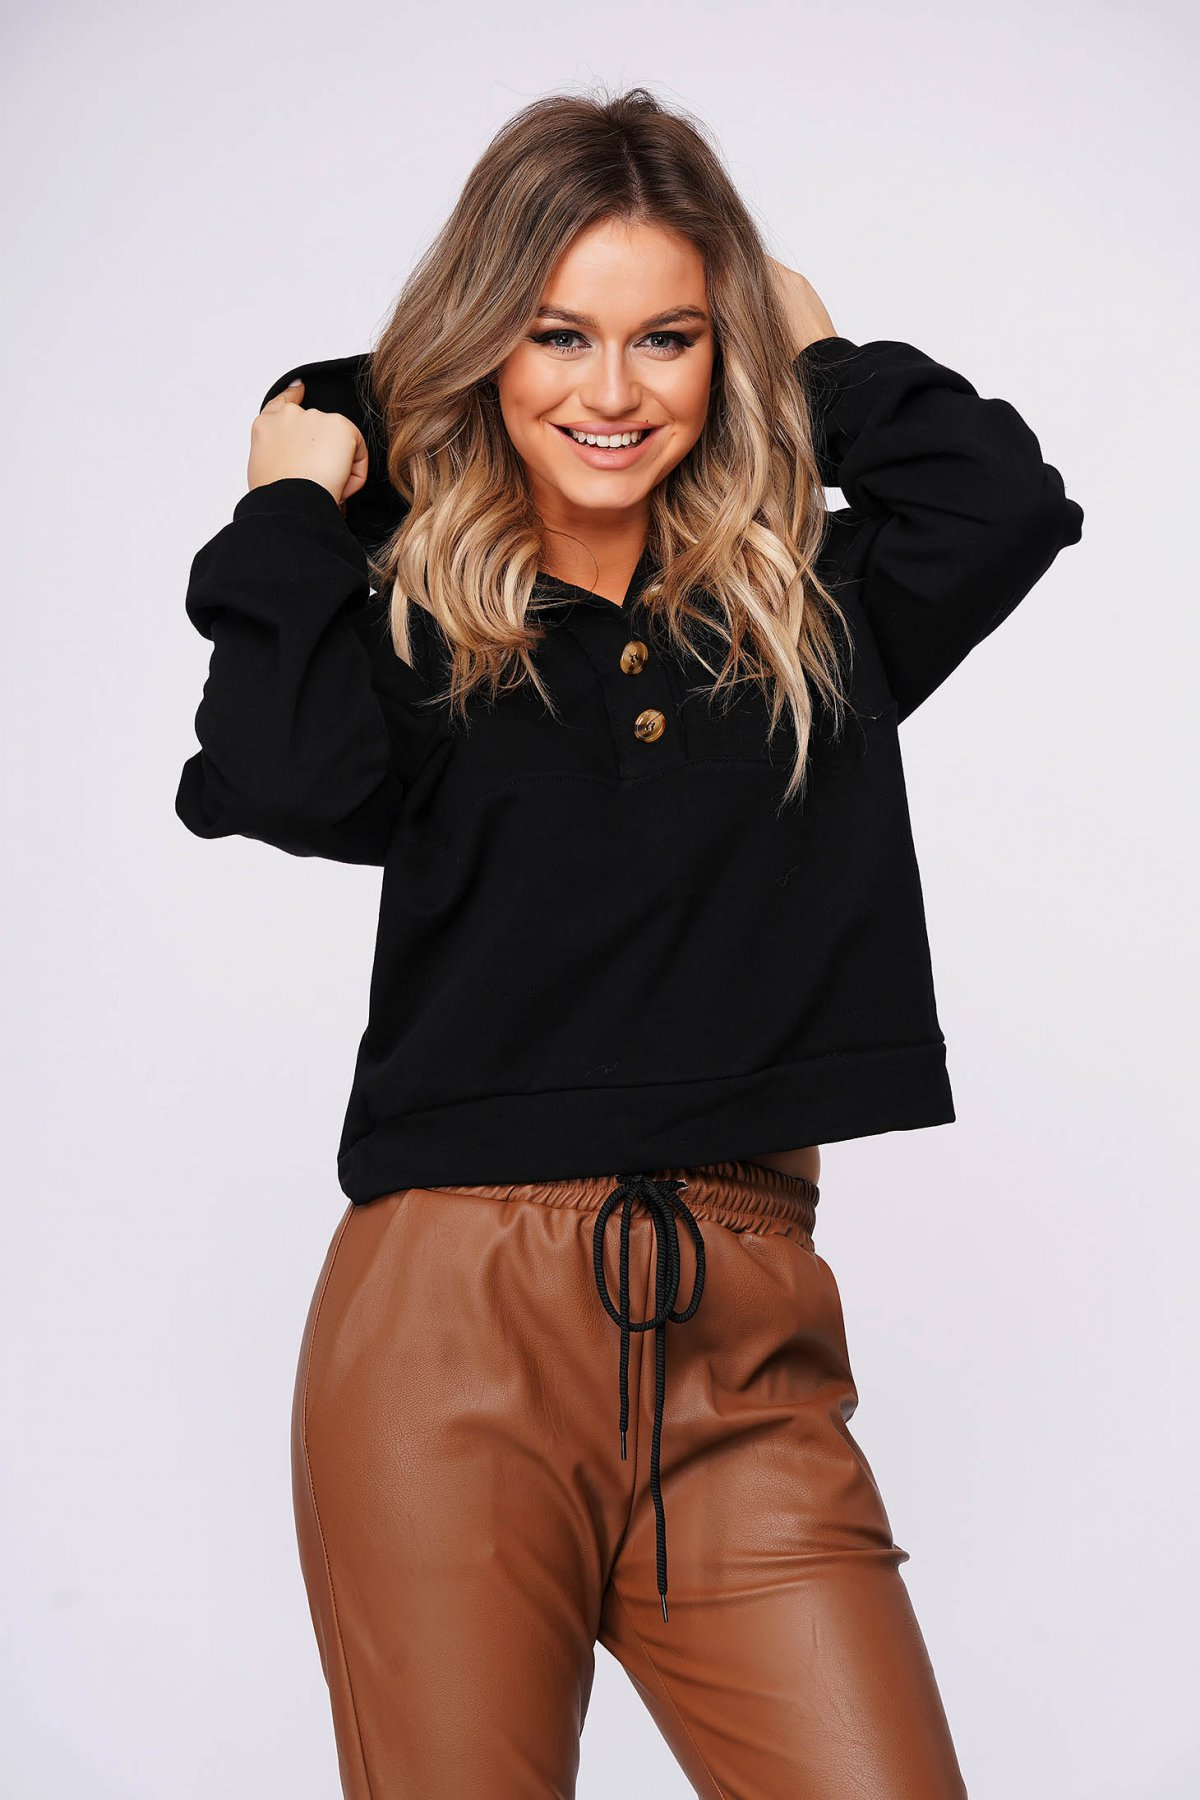 Bluza dama SunShine din bumbac usor elastic neagra casual scurta cu croi larg